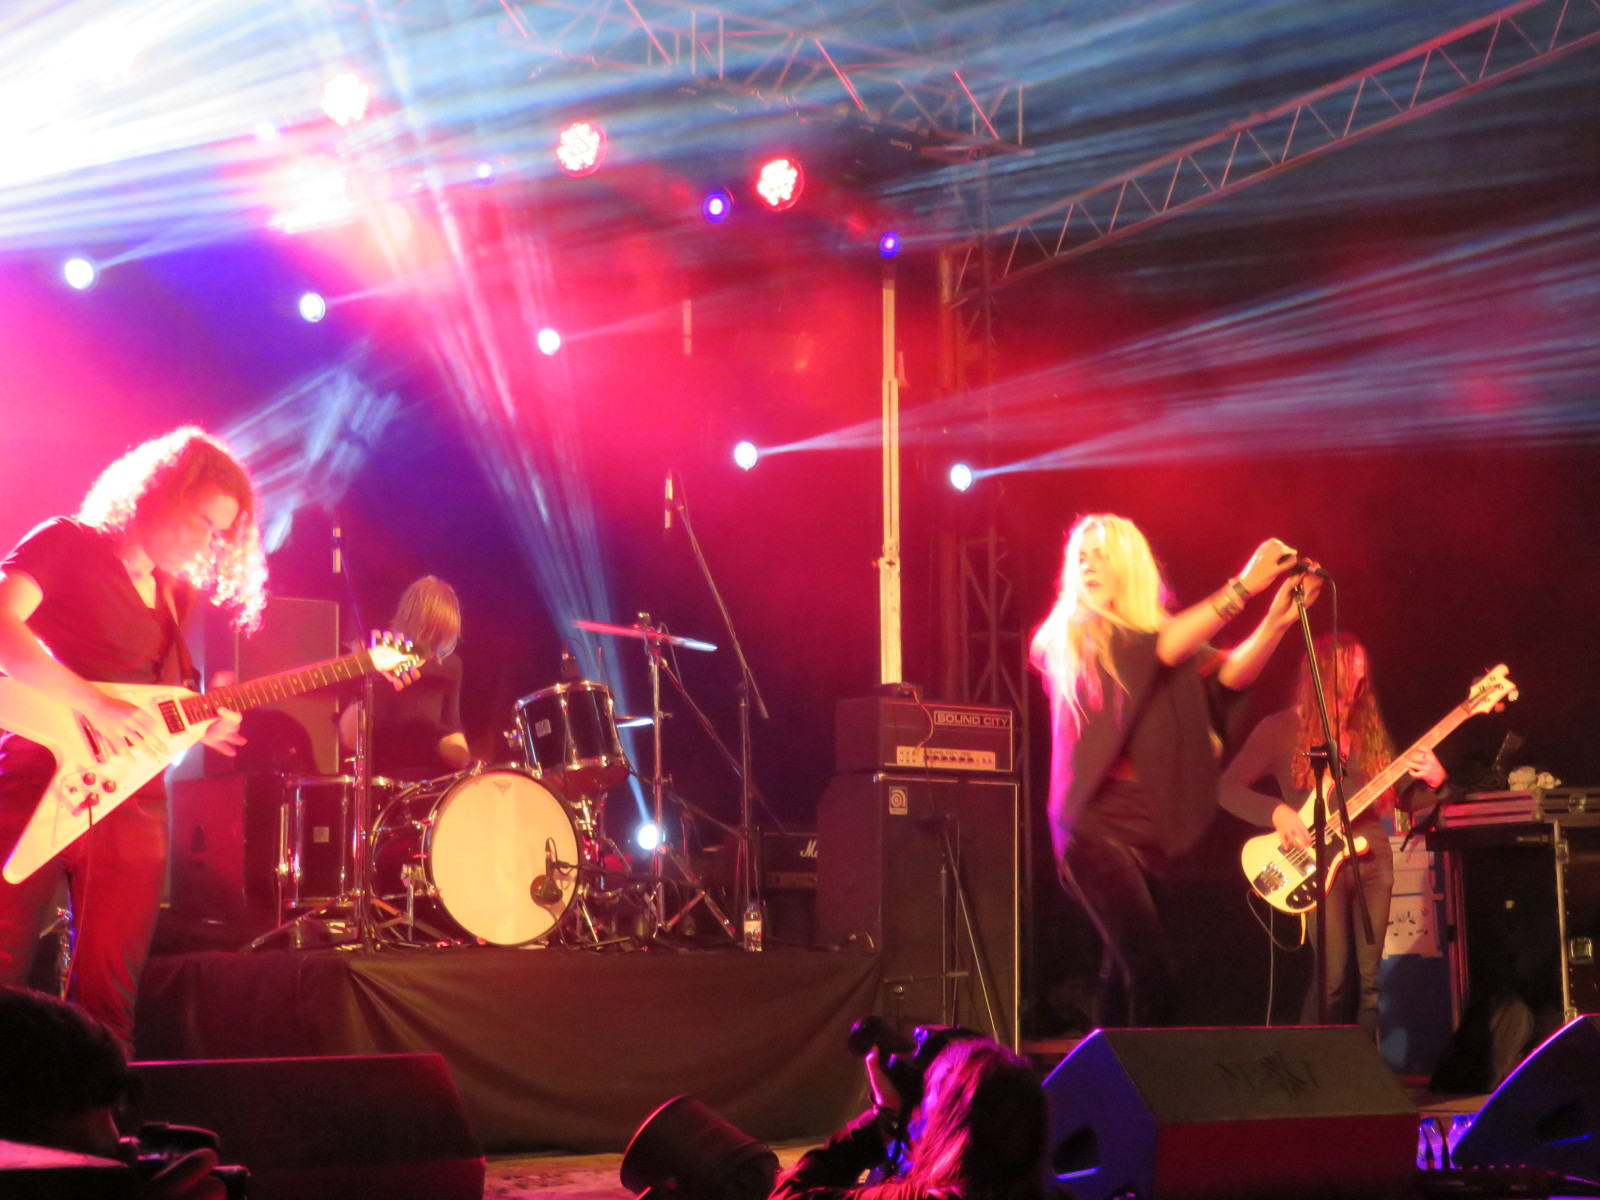 Sonic Blast 2020. Moledo, Portugal. 13 - 15 agosto  - Página 2 29ljwjd